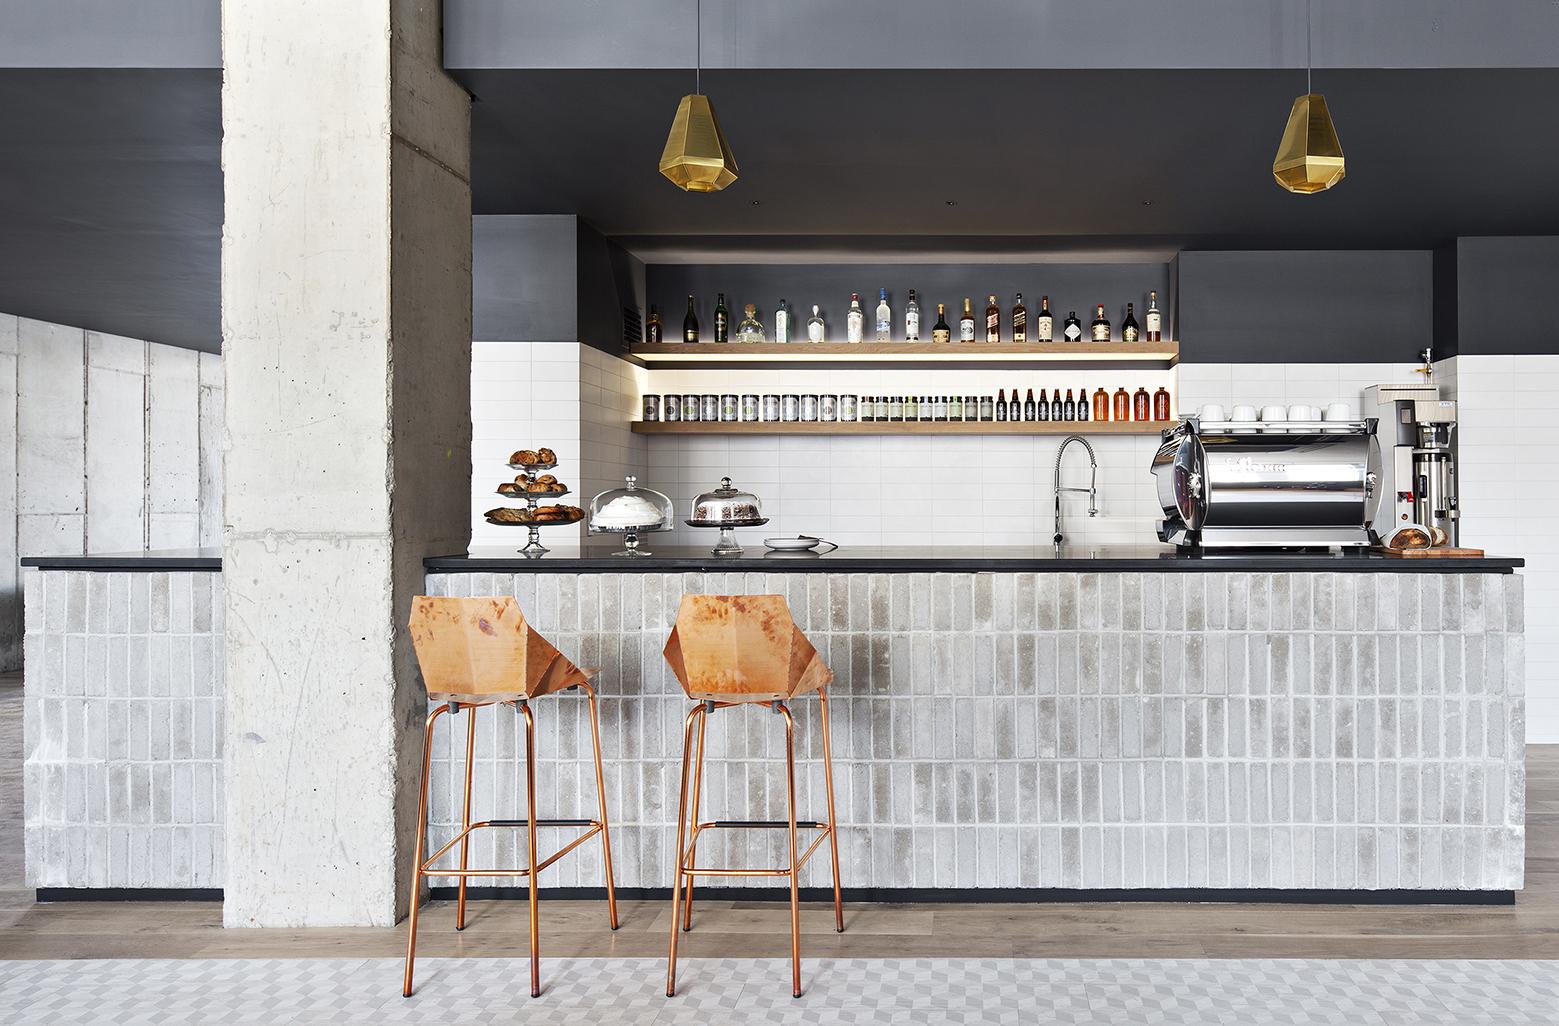 El Hotel Boro / Grzywinski+Pons